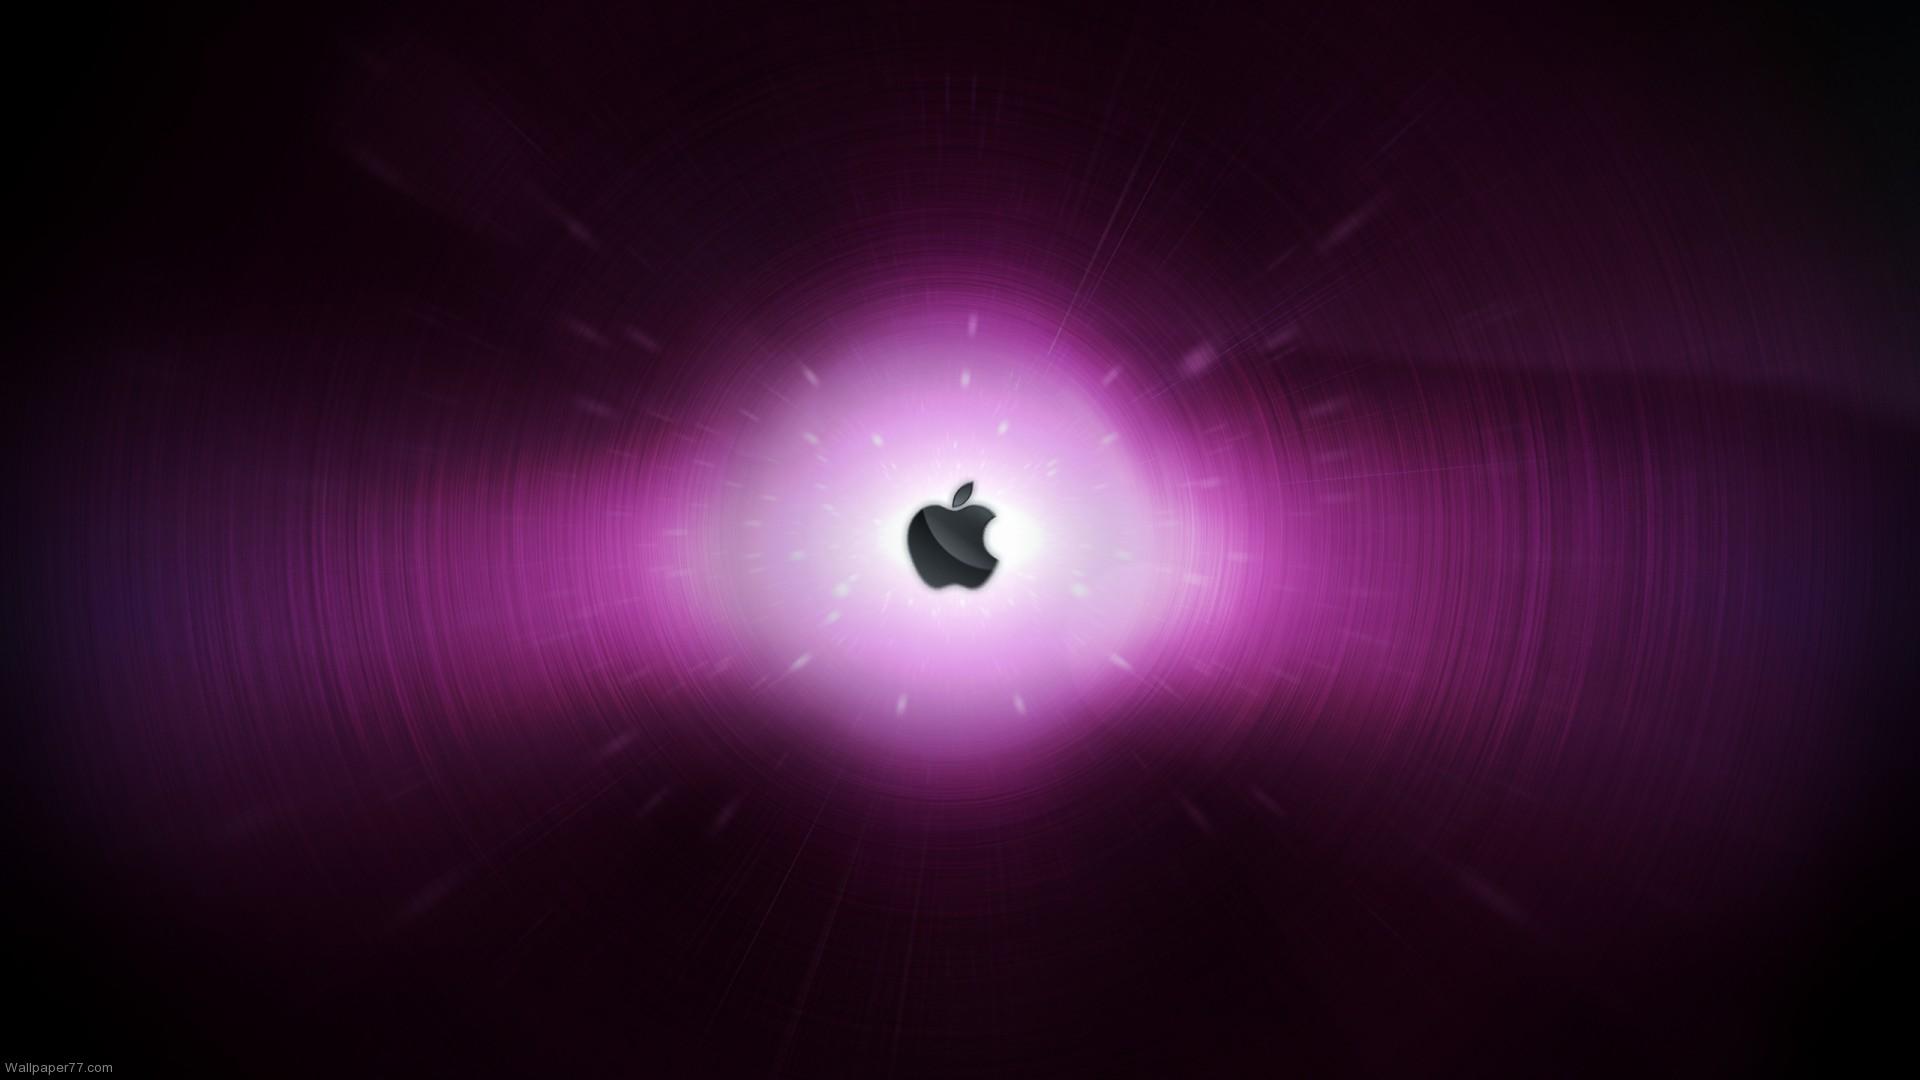 Apple in Purple apple wallpapers computer wallpapers 1920x1080jpg 1920x1080